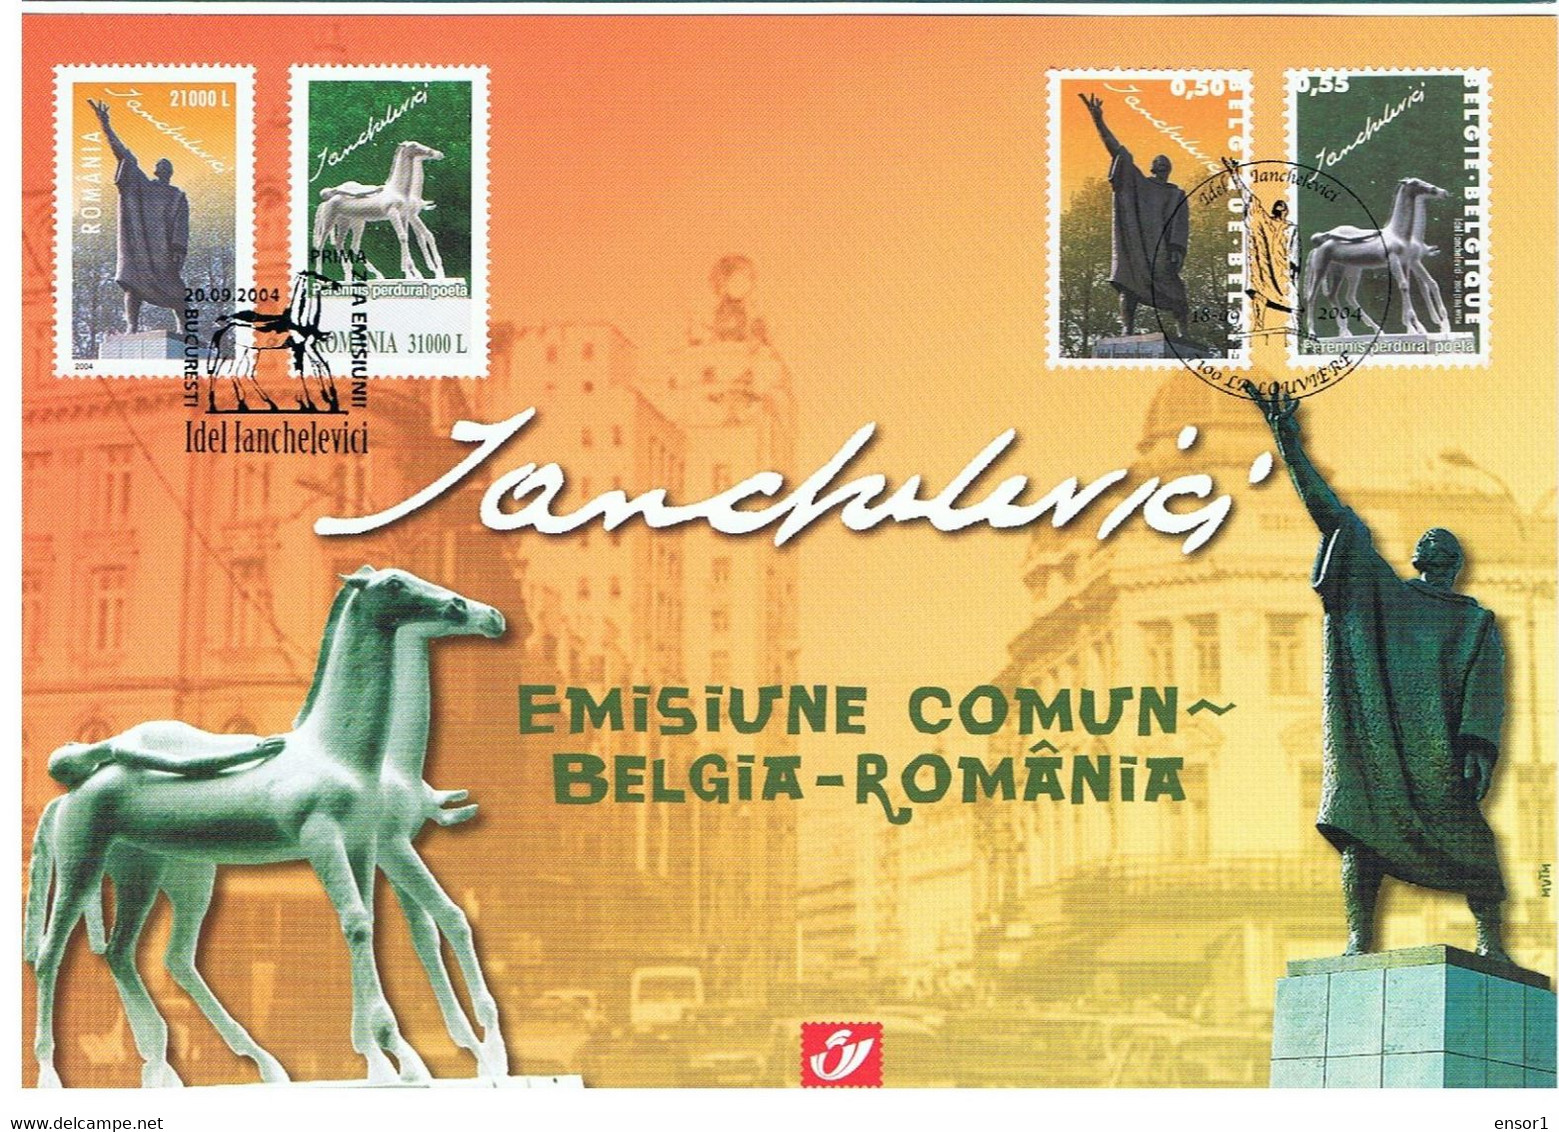 België 2004 Herdenkingskaart 3308-09HK Roemenië Beeldhouwer Igar Lanchlevici - Souvenir Cards